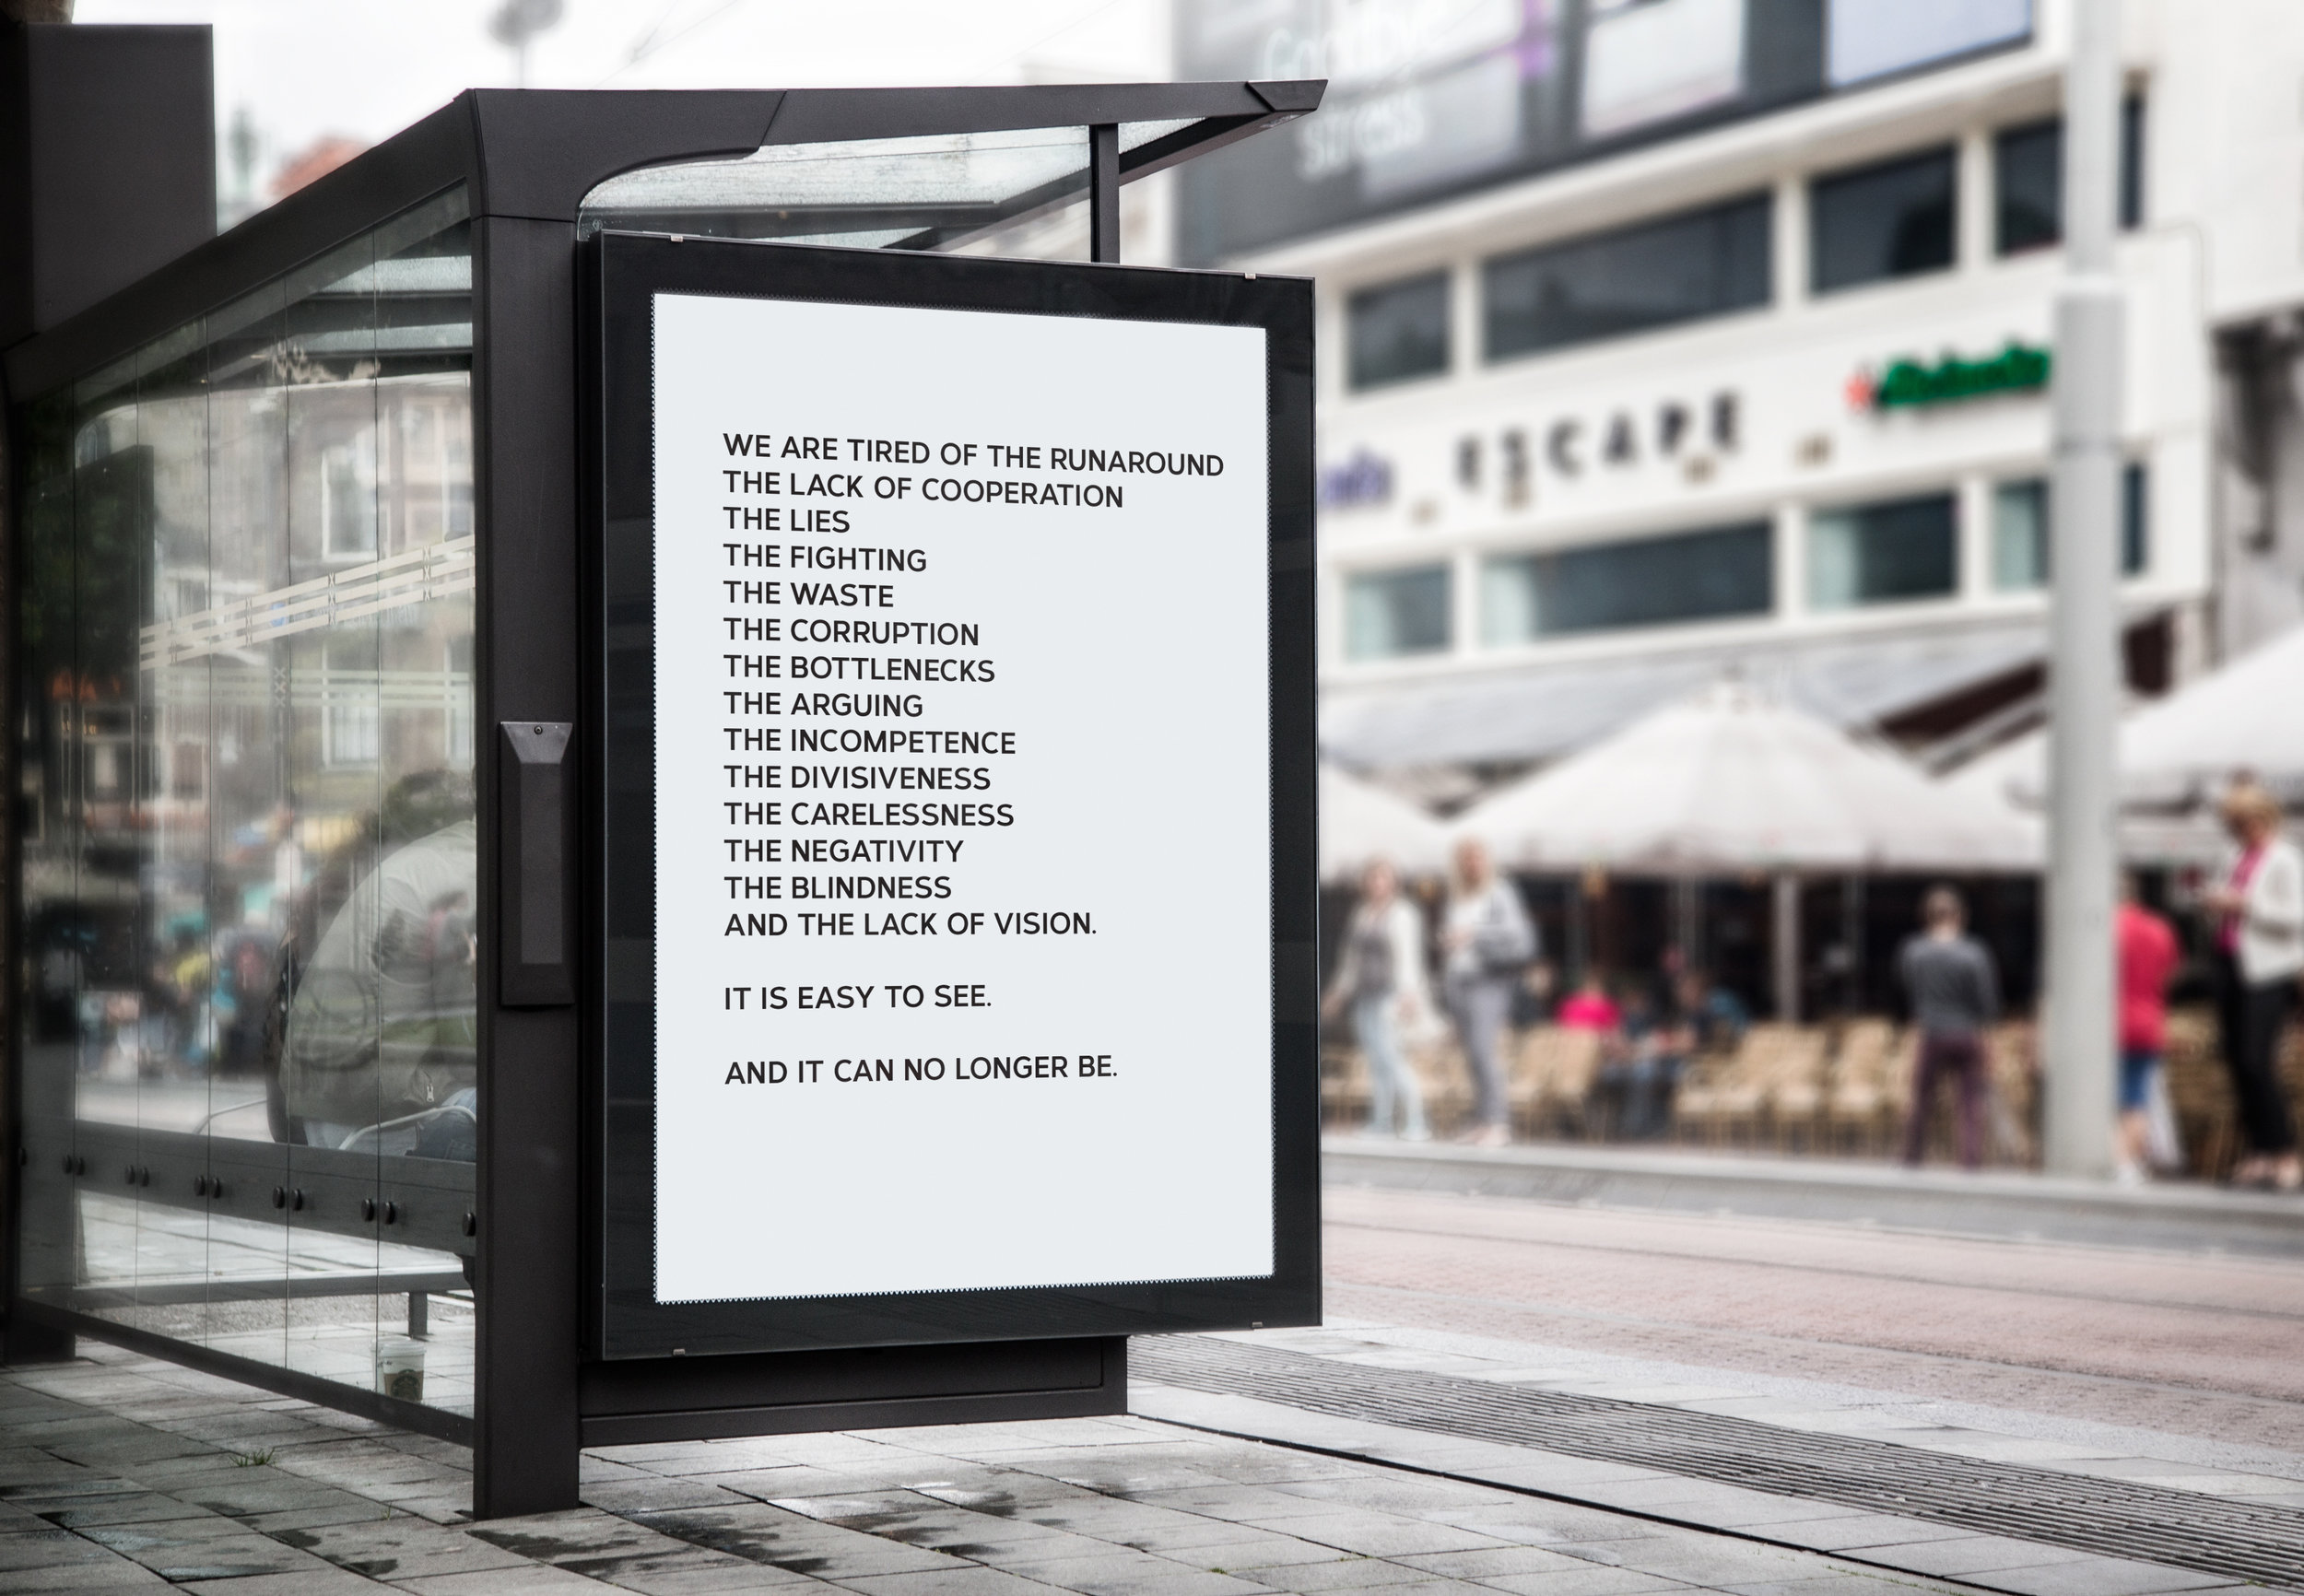 3D_billboard_bus-stop_2_NL_3800w.jpg